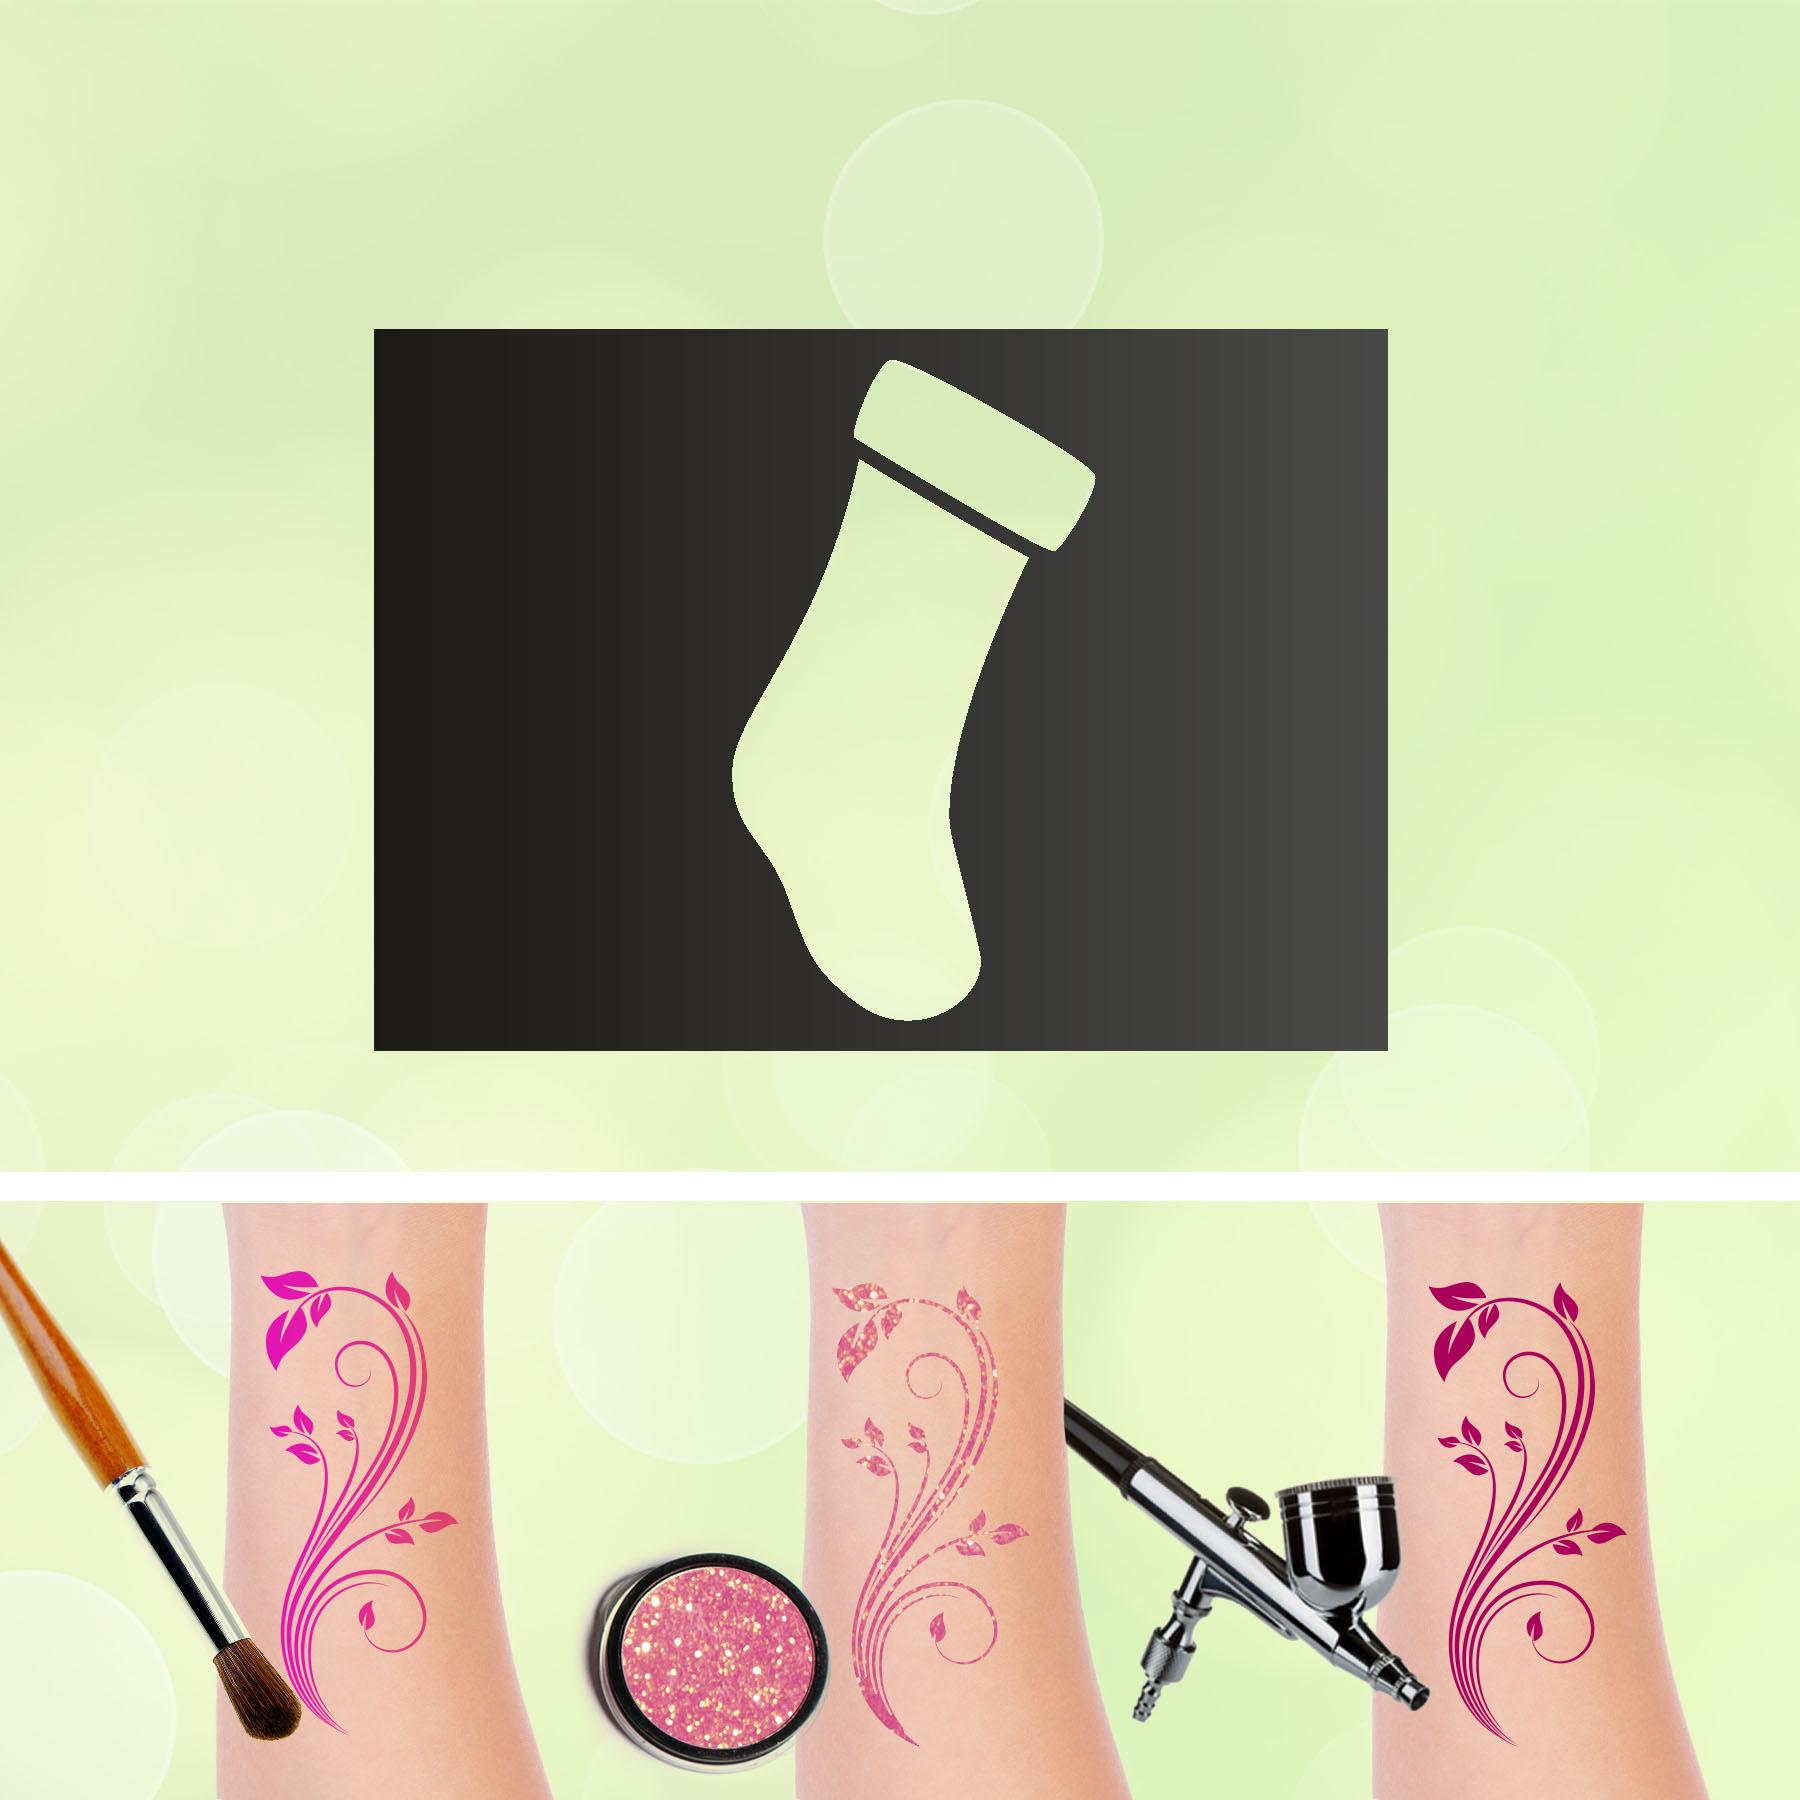 Tattoo Schablone Socke Selbstklebend Kinder Schminken Airbrush